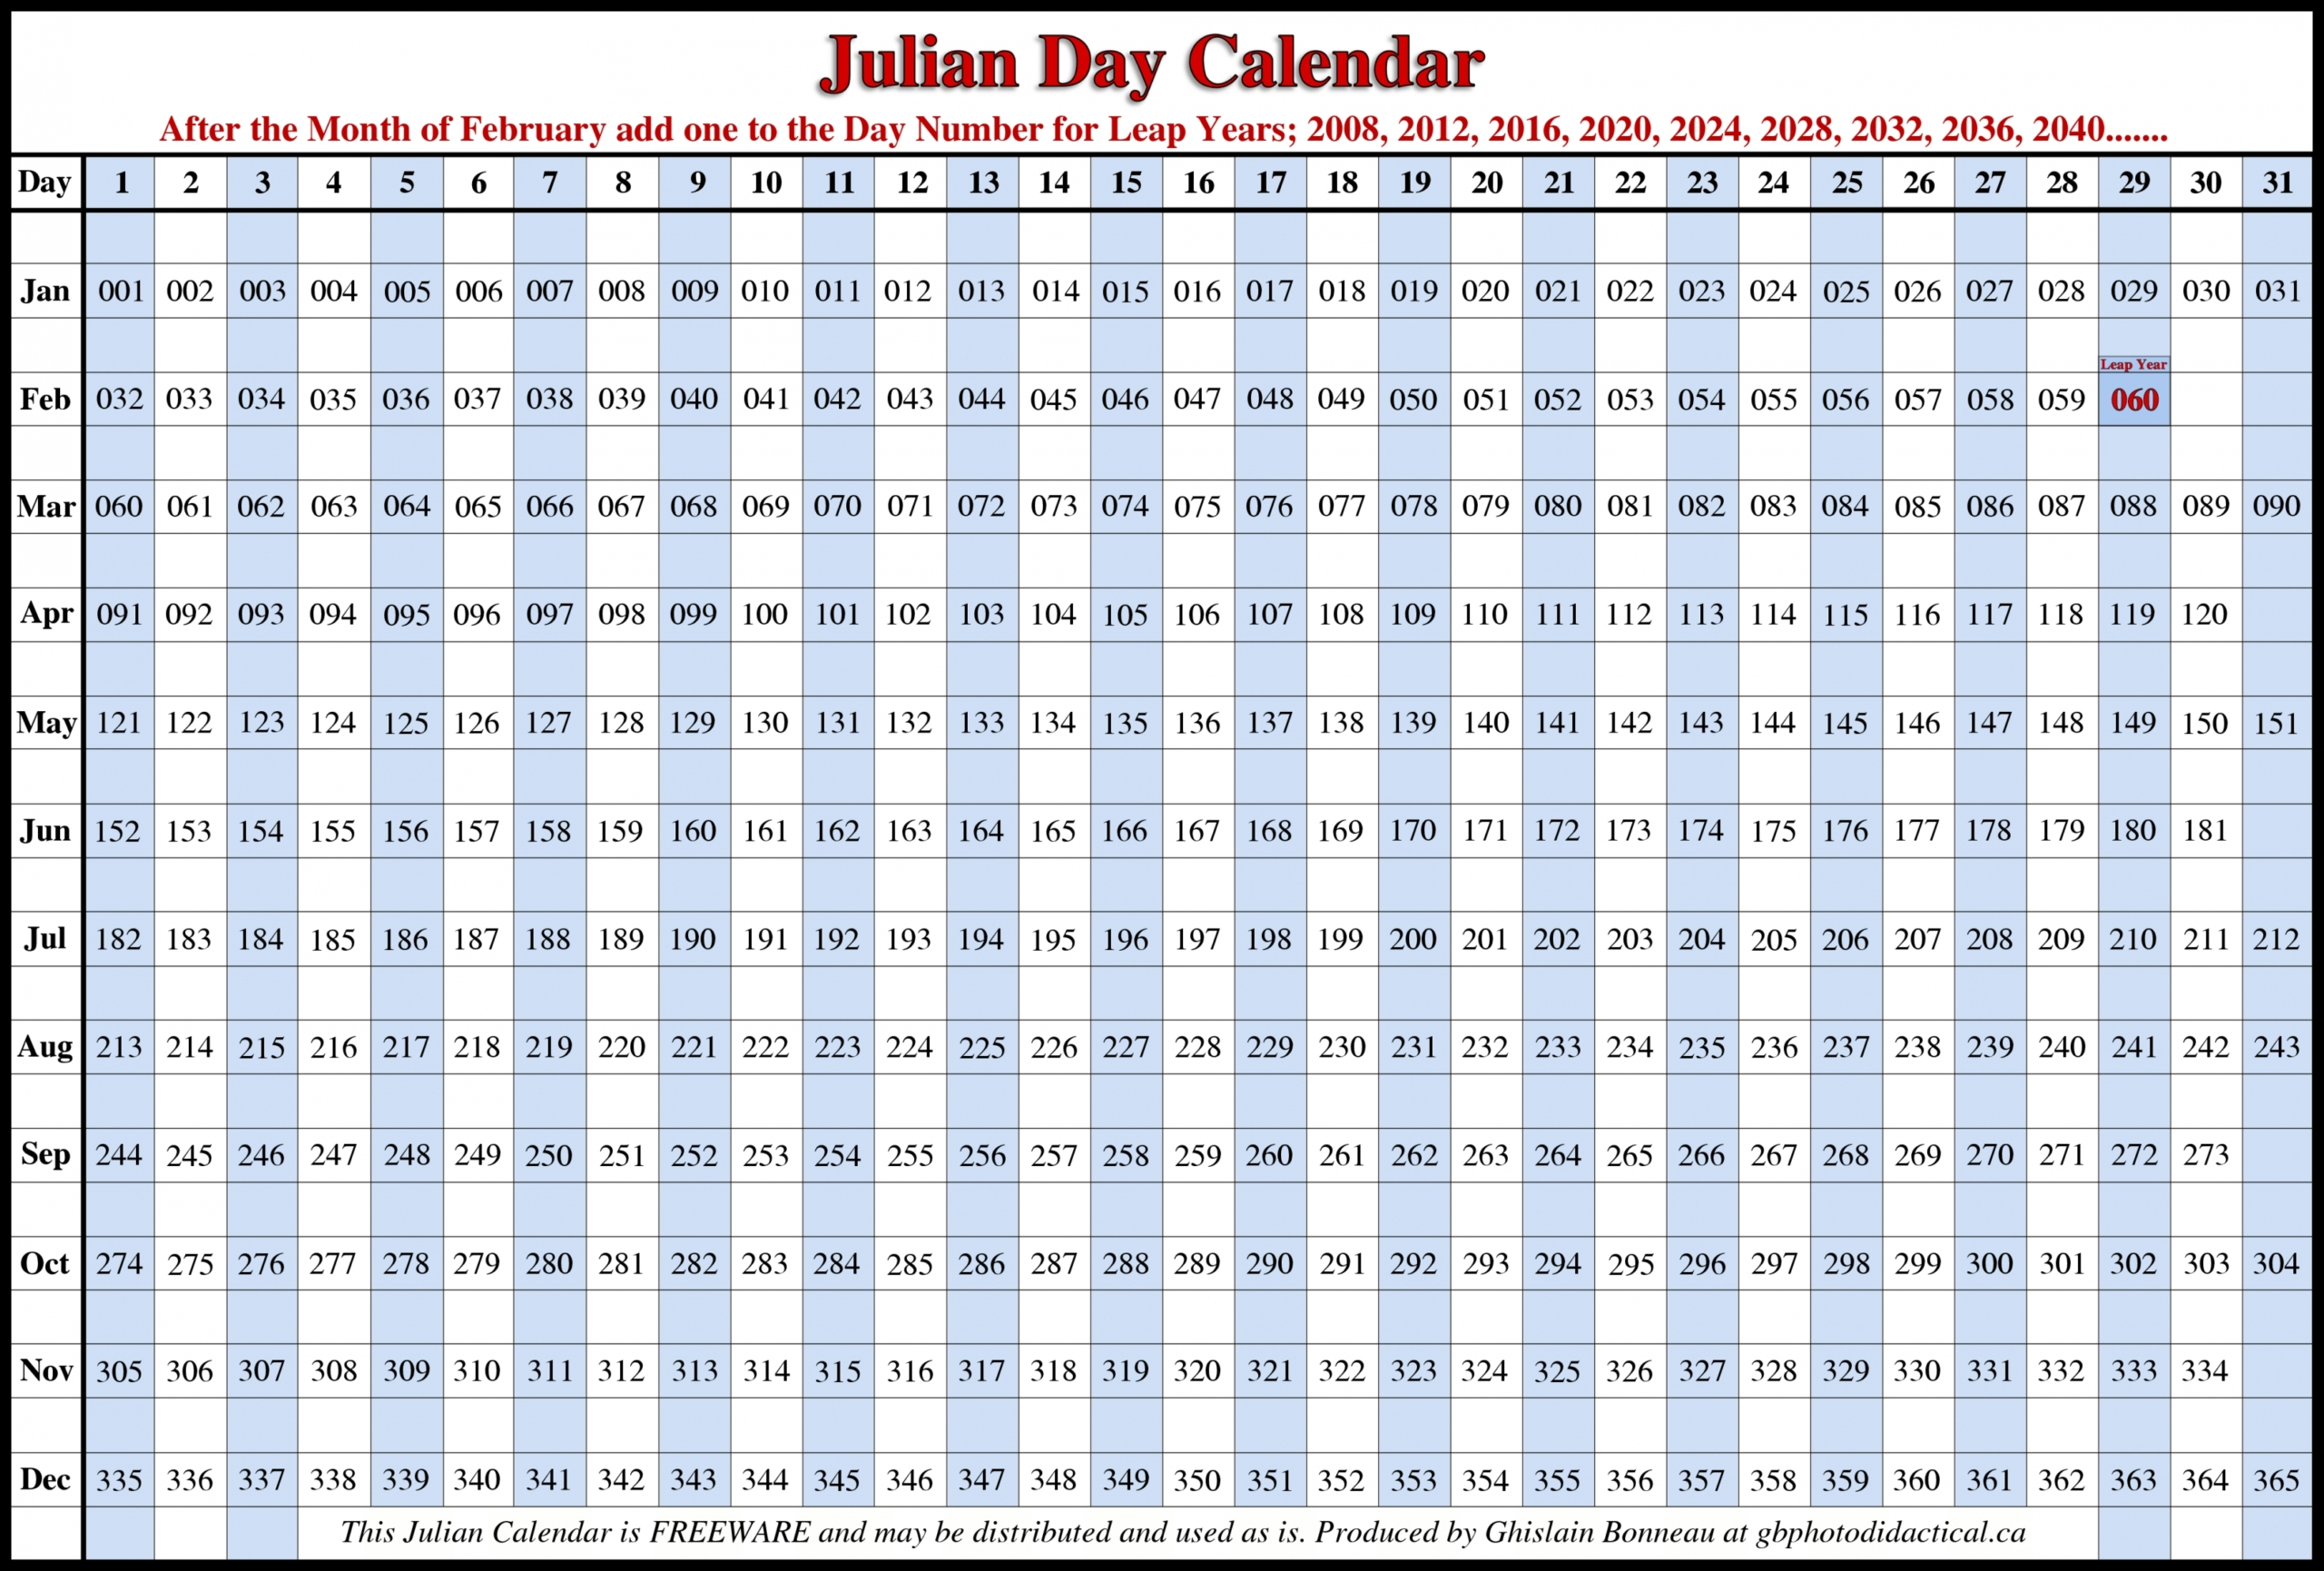 Free Printable Julian Date Calendar 2021 In 2020 | Calendar